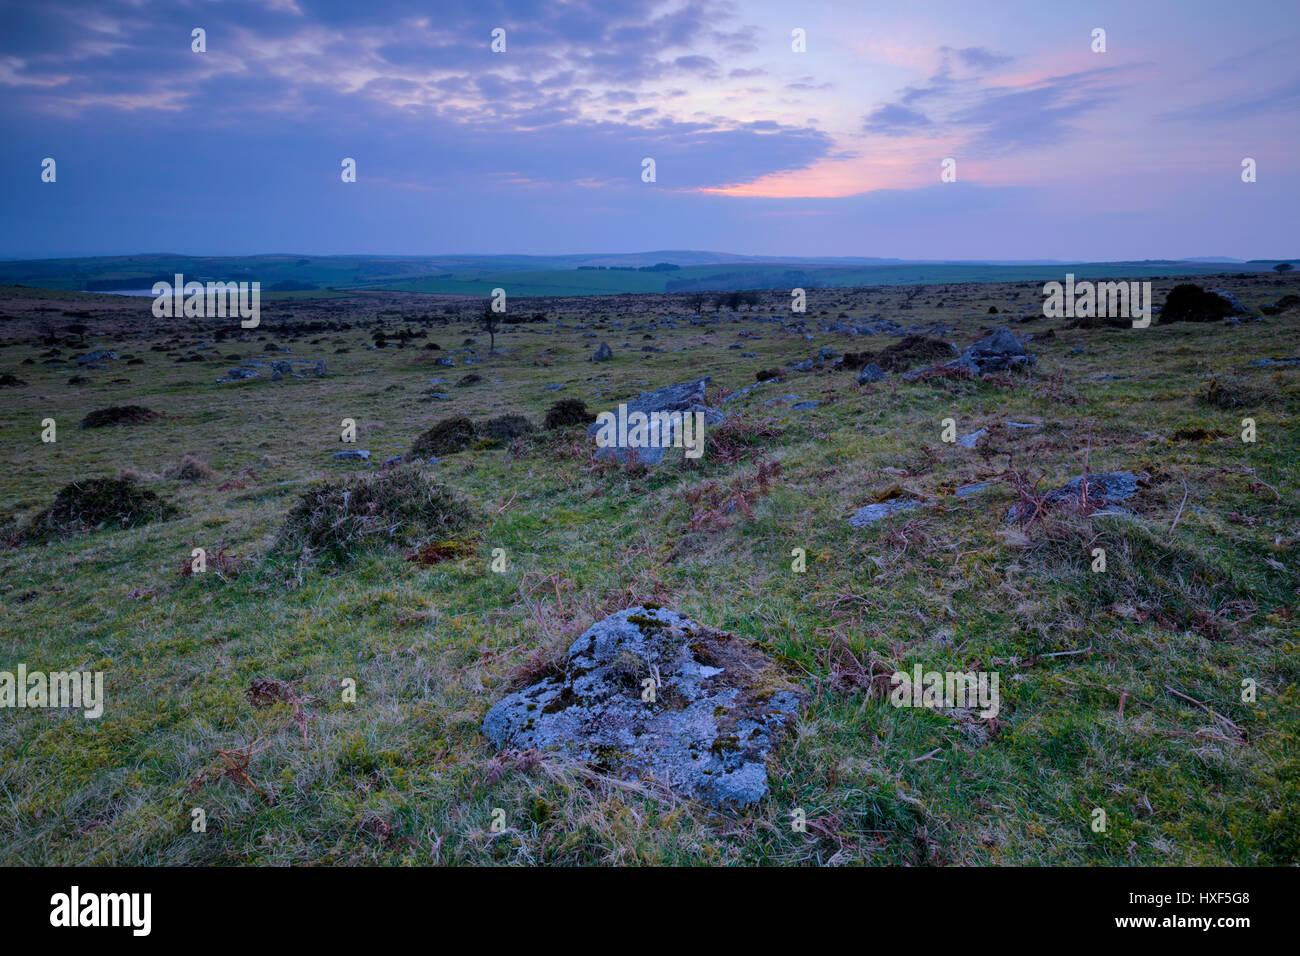 Sun setting on Bodmin Moor near the moorland village of Minions - Stock Image